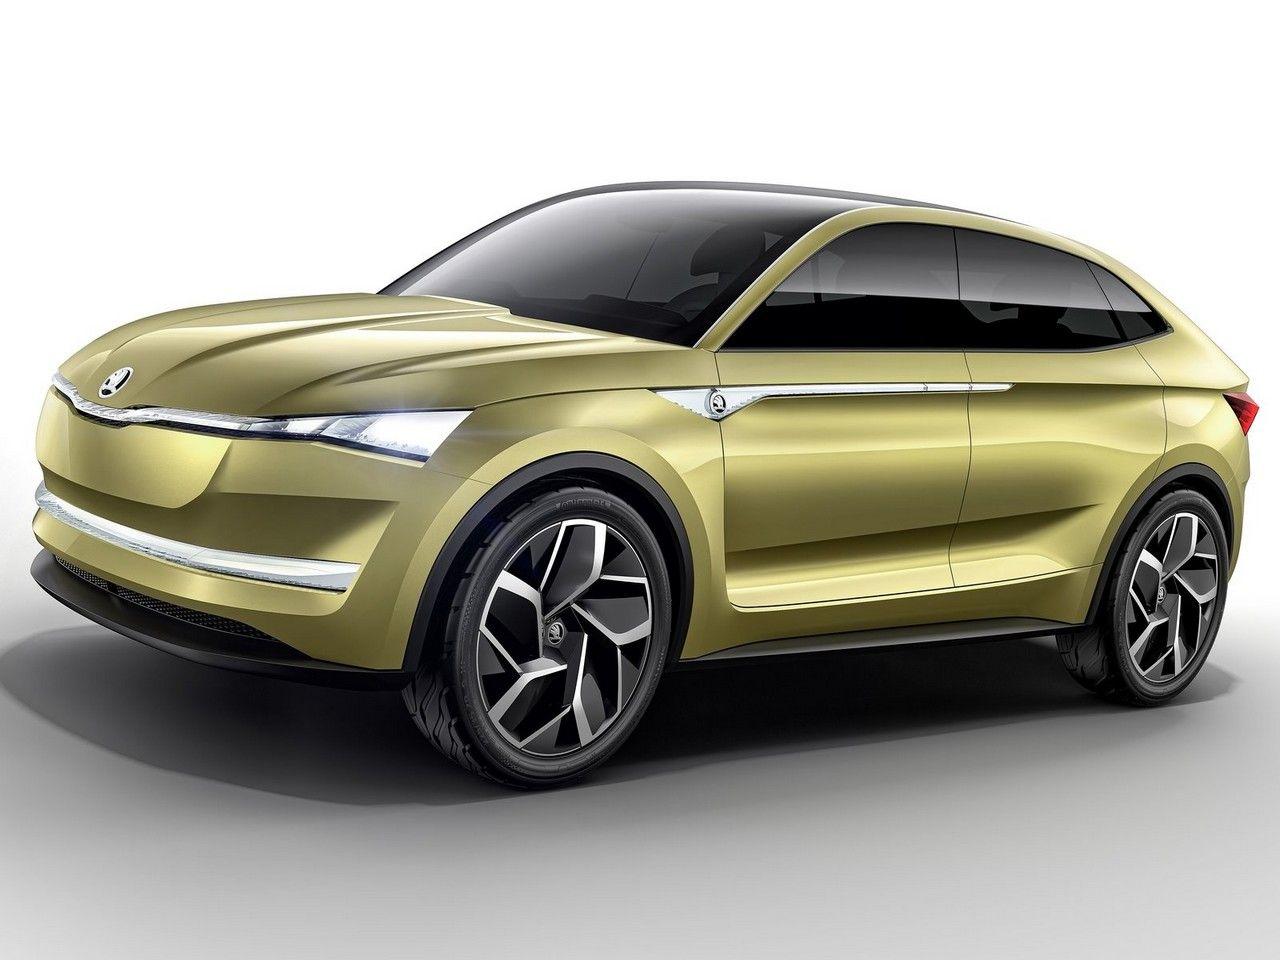 skoda vision e concept 2017 v hicule 100 lectrique la voiture lectrique voitures. Black Bedroom Furniture Sets. Home Design Ideas